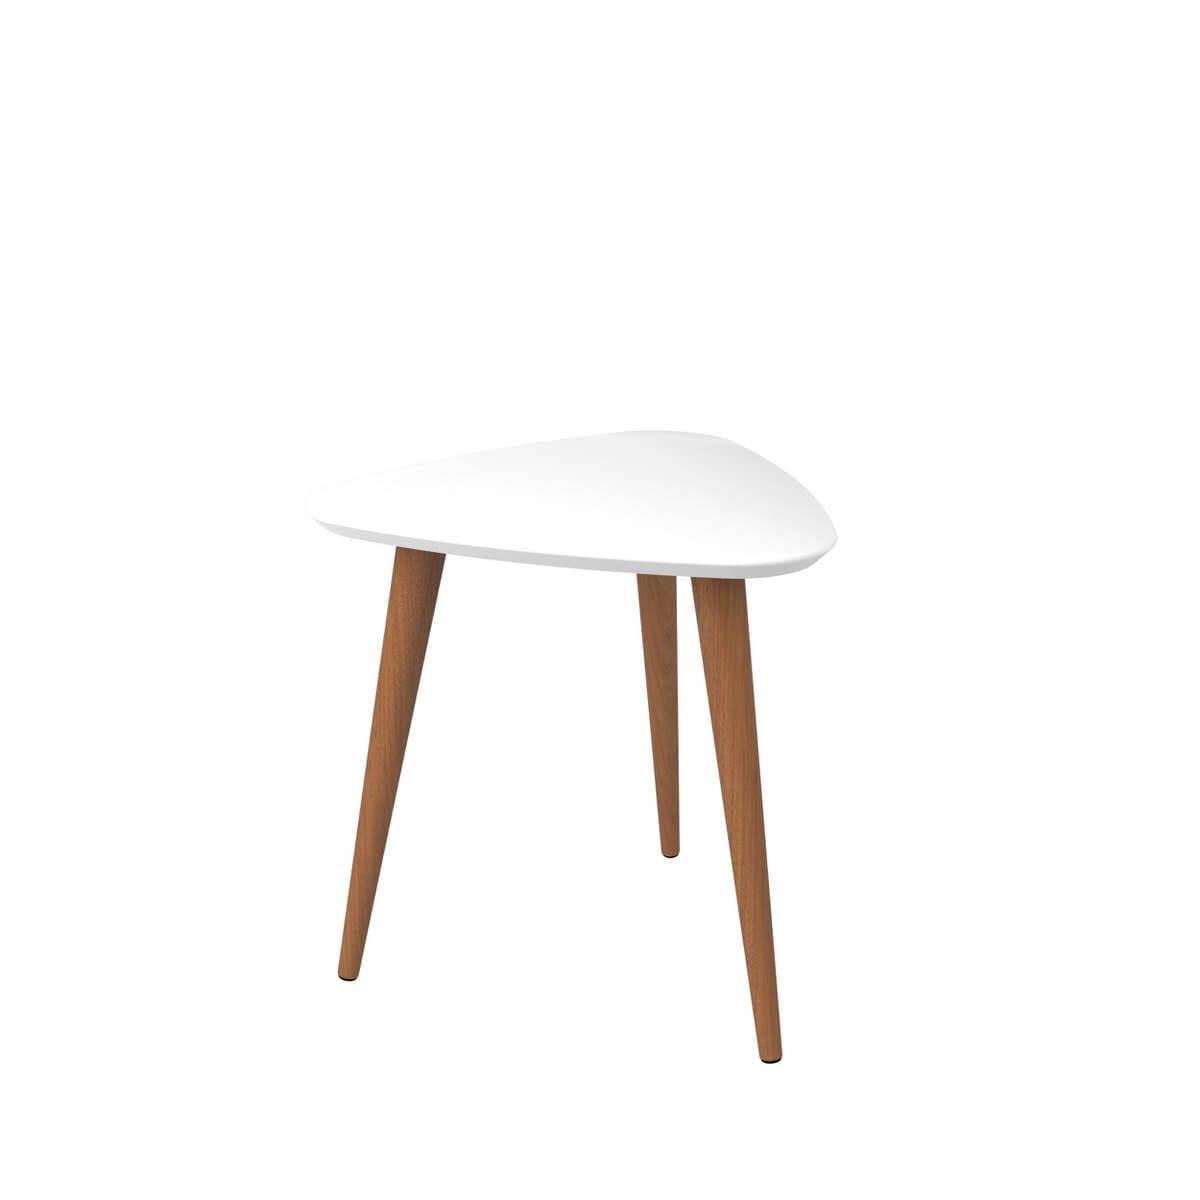 Tremendous Utopia Off White Maple Cream 19 68 Inch High Triangle End Table W Splayed Wooden Legs By Manhattan Comfort Uwap Interior Chair Design Uwaporg